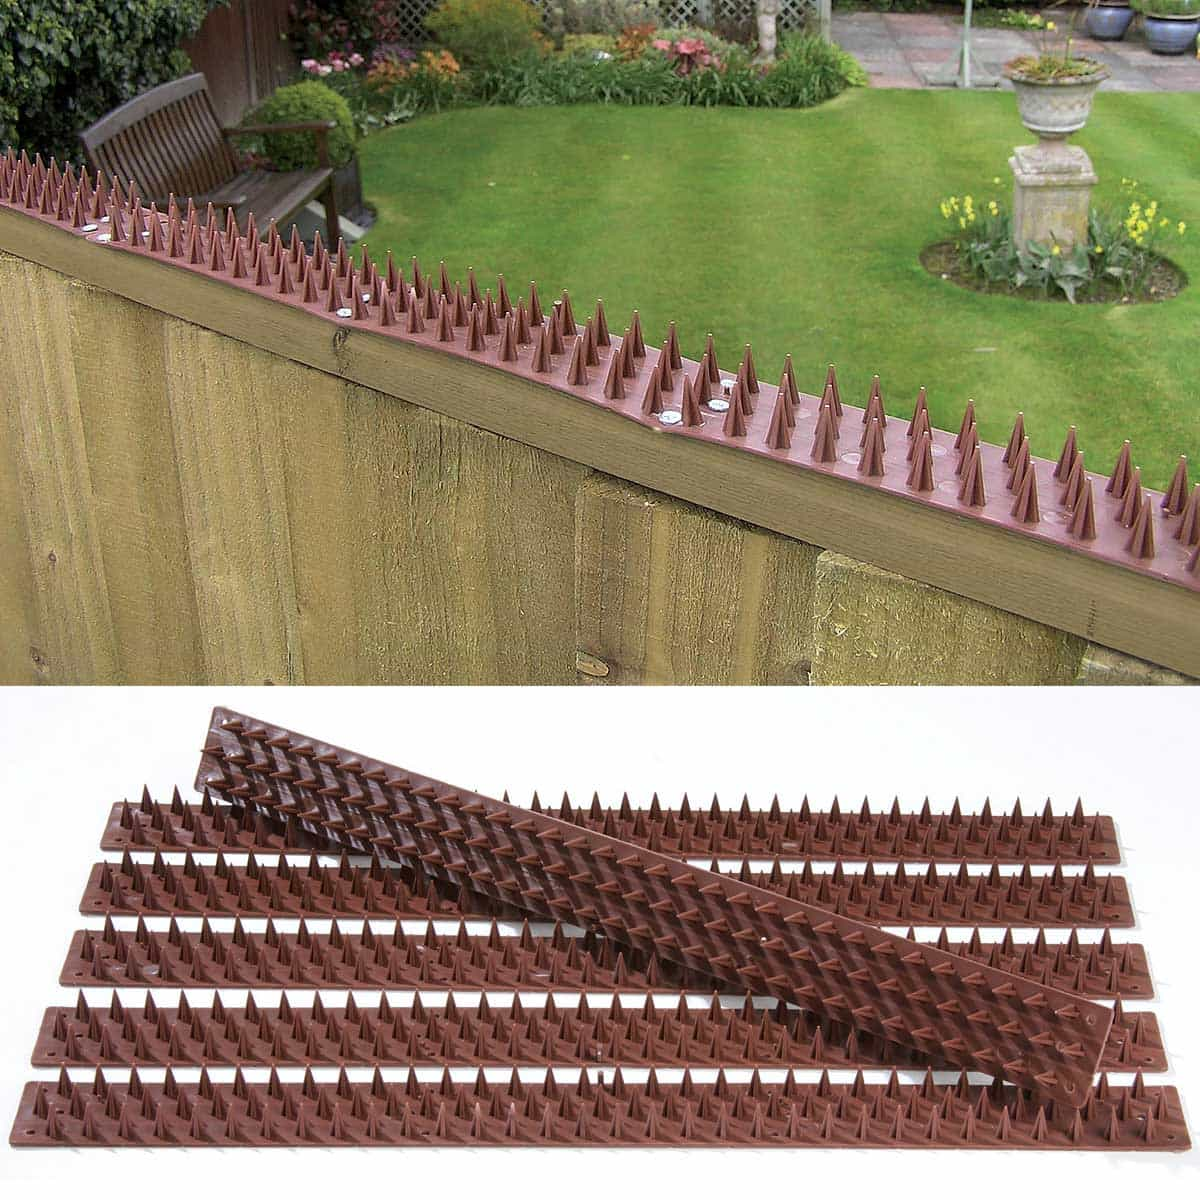 Barri re anti pigeons inoffensive 3m de long en plastique for Anti fourmis naturel jardin